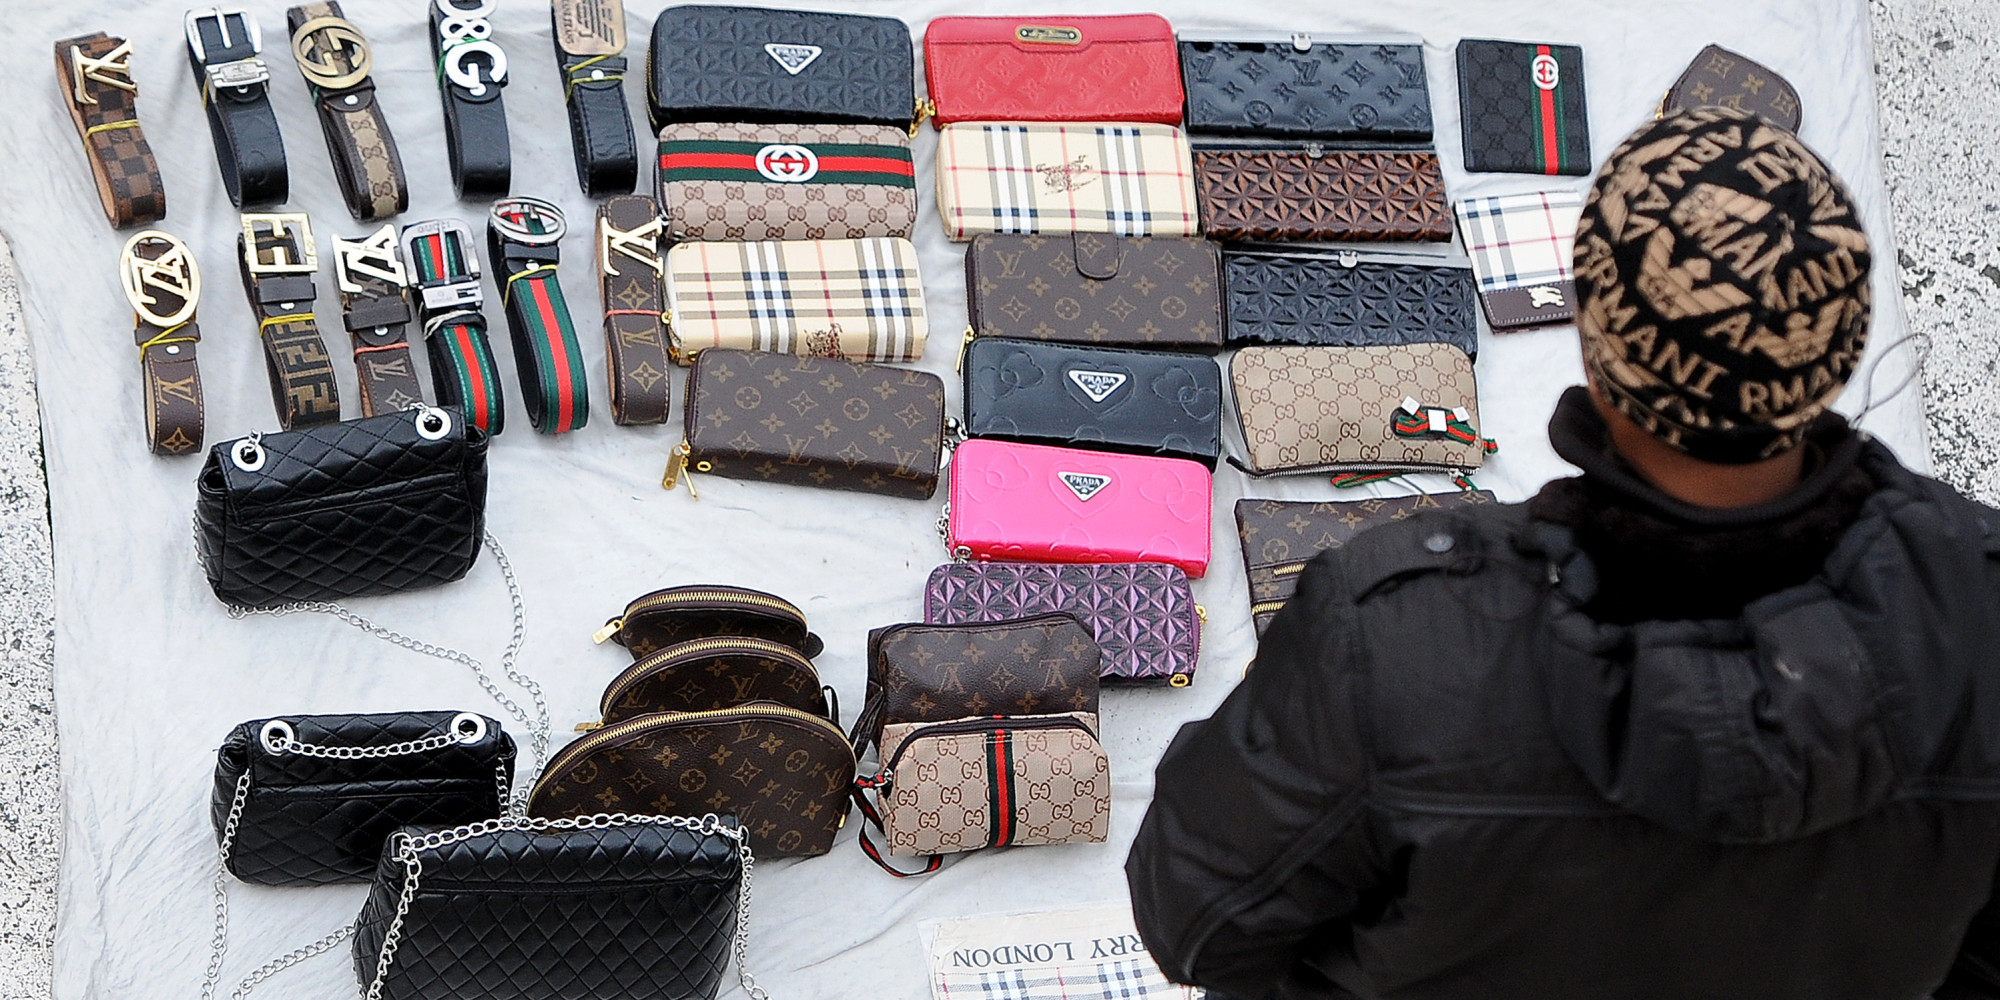 Immitation Gucci Handbag From Korea 103